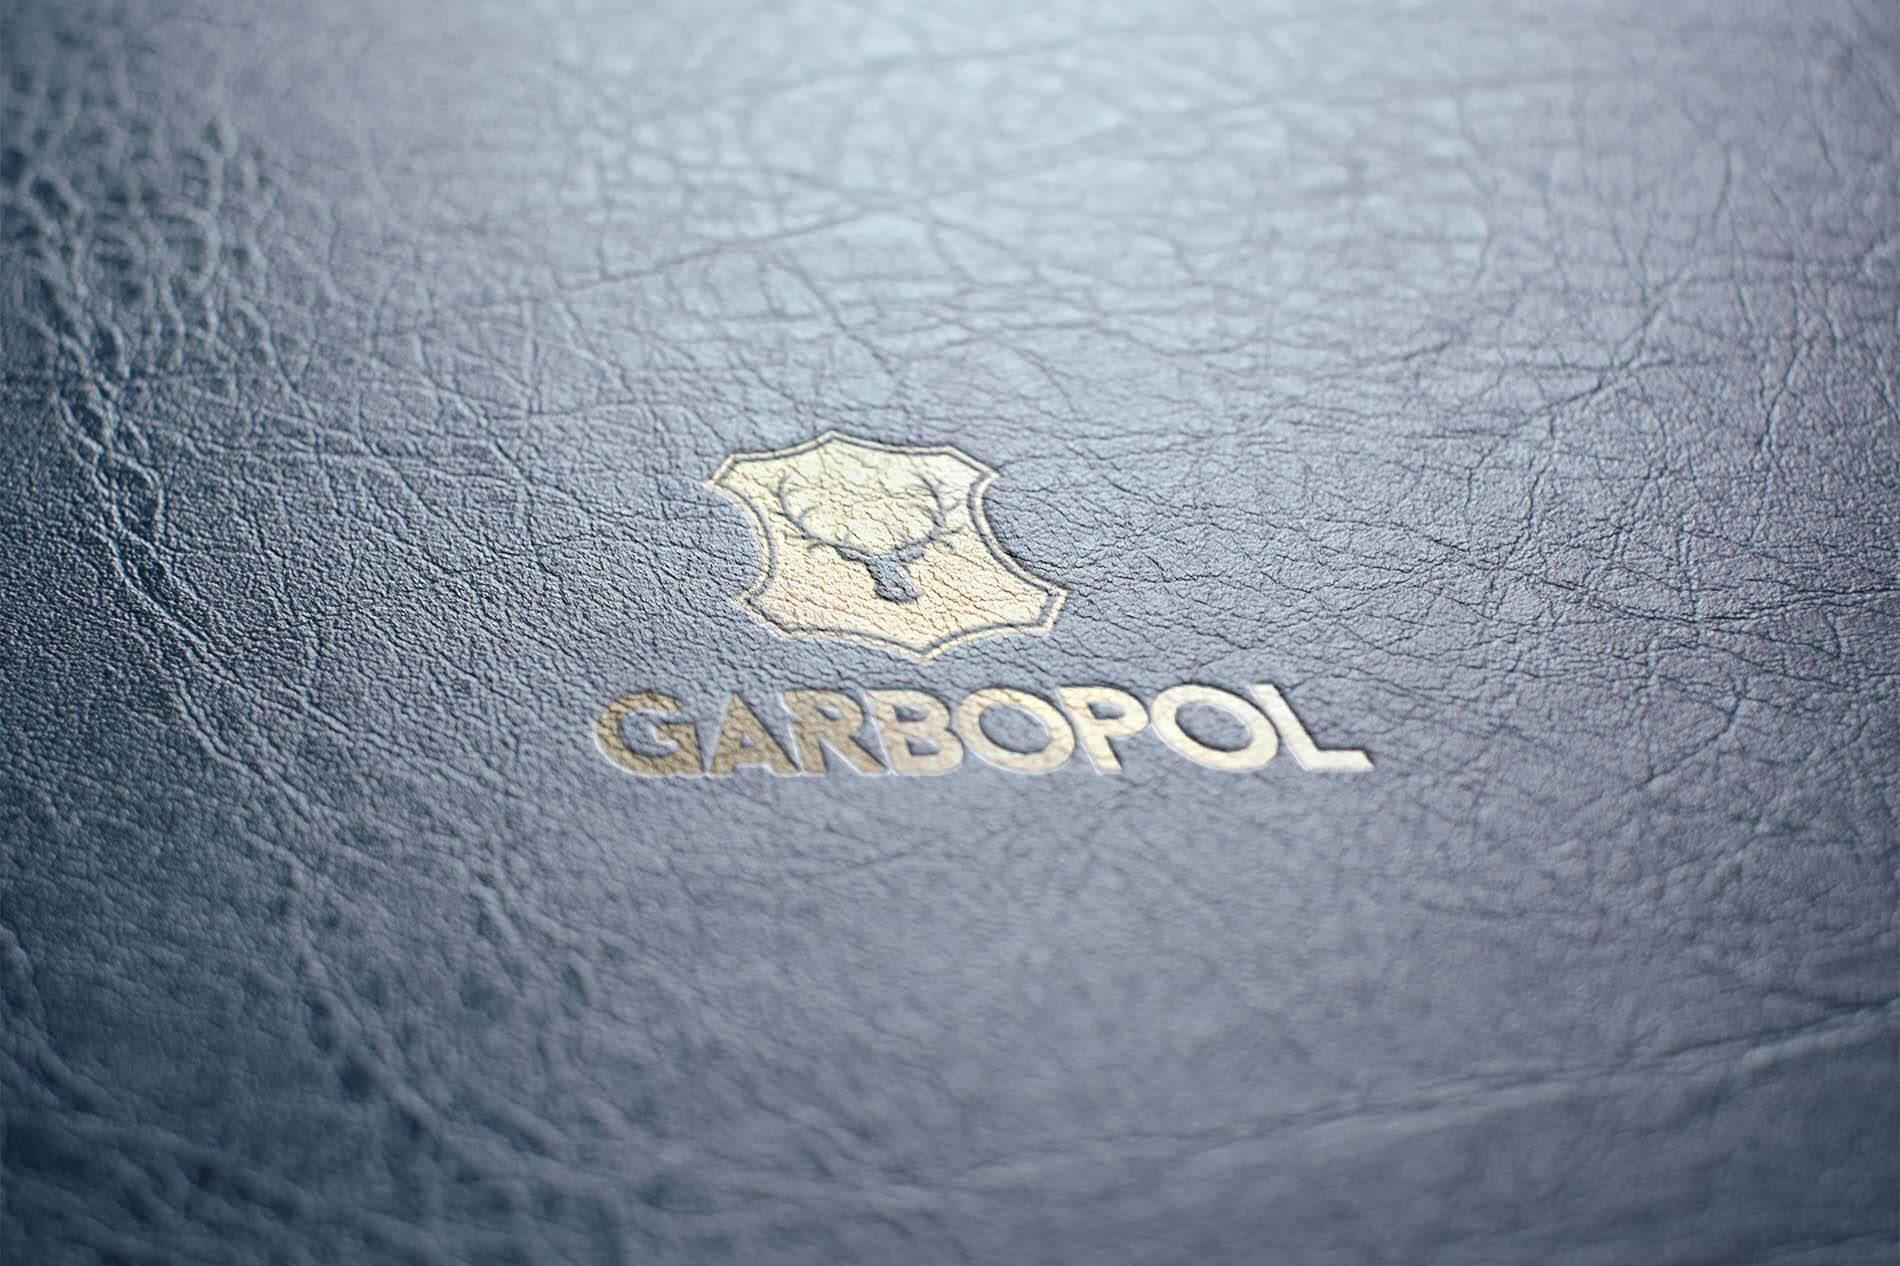 Garbopol